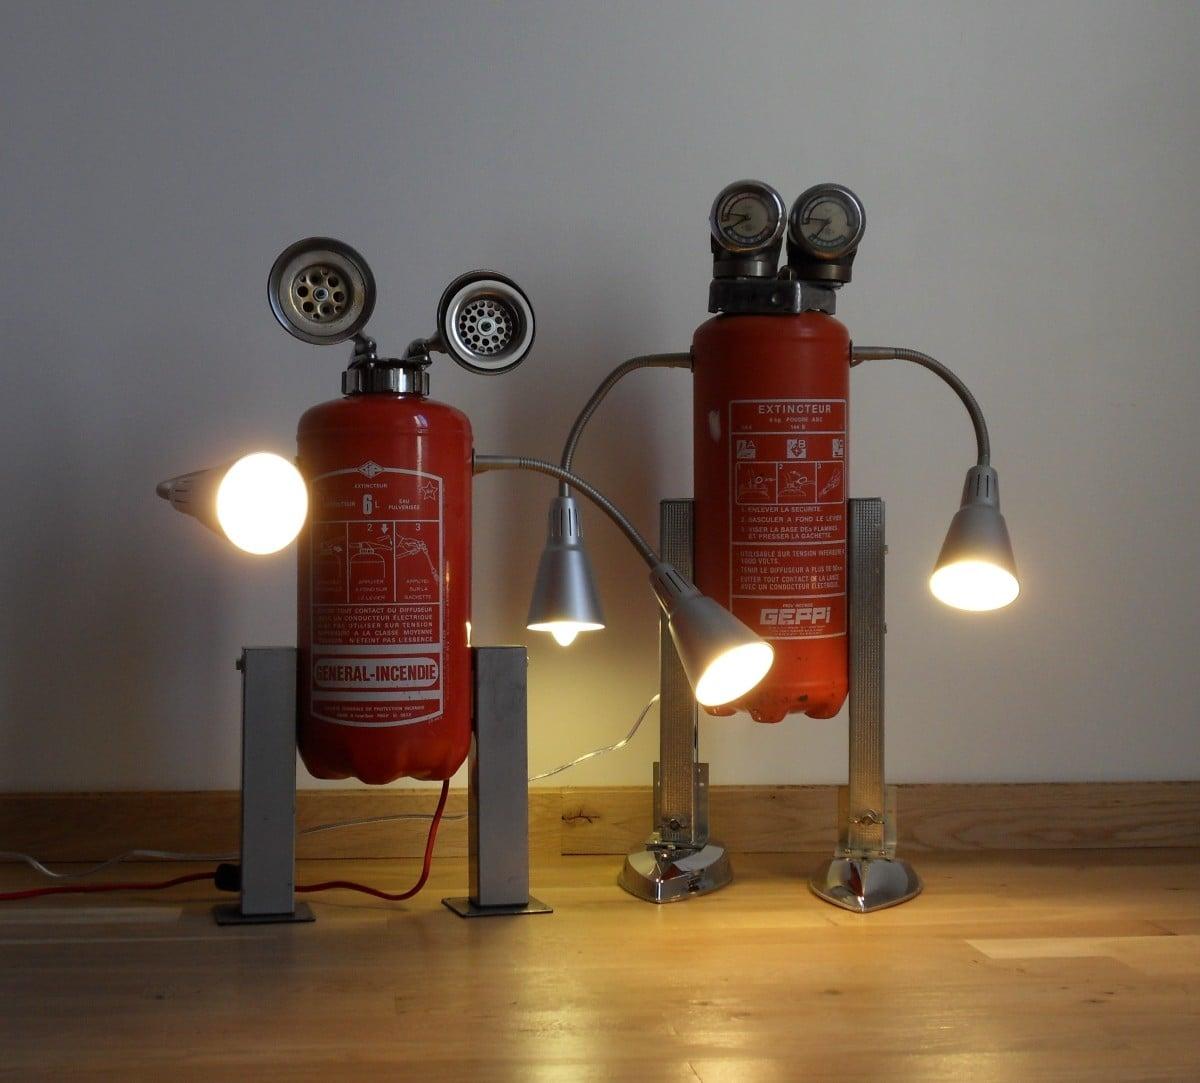 Ikea kvart robot lamps ikea hackers ikea hackers - Deco recyclage recuperation ...